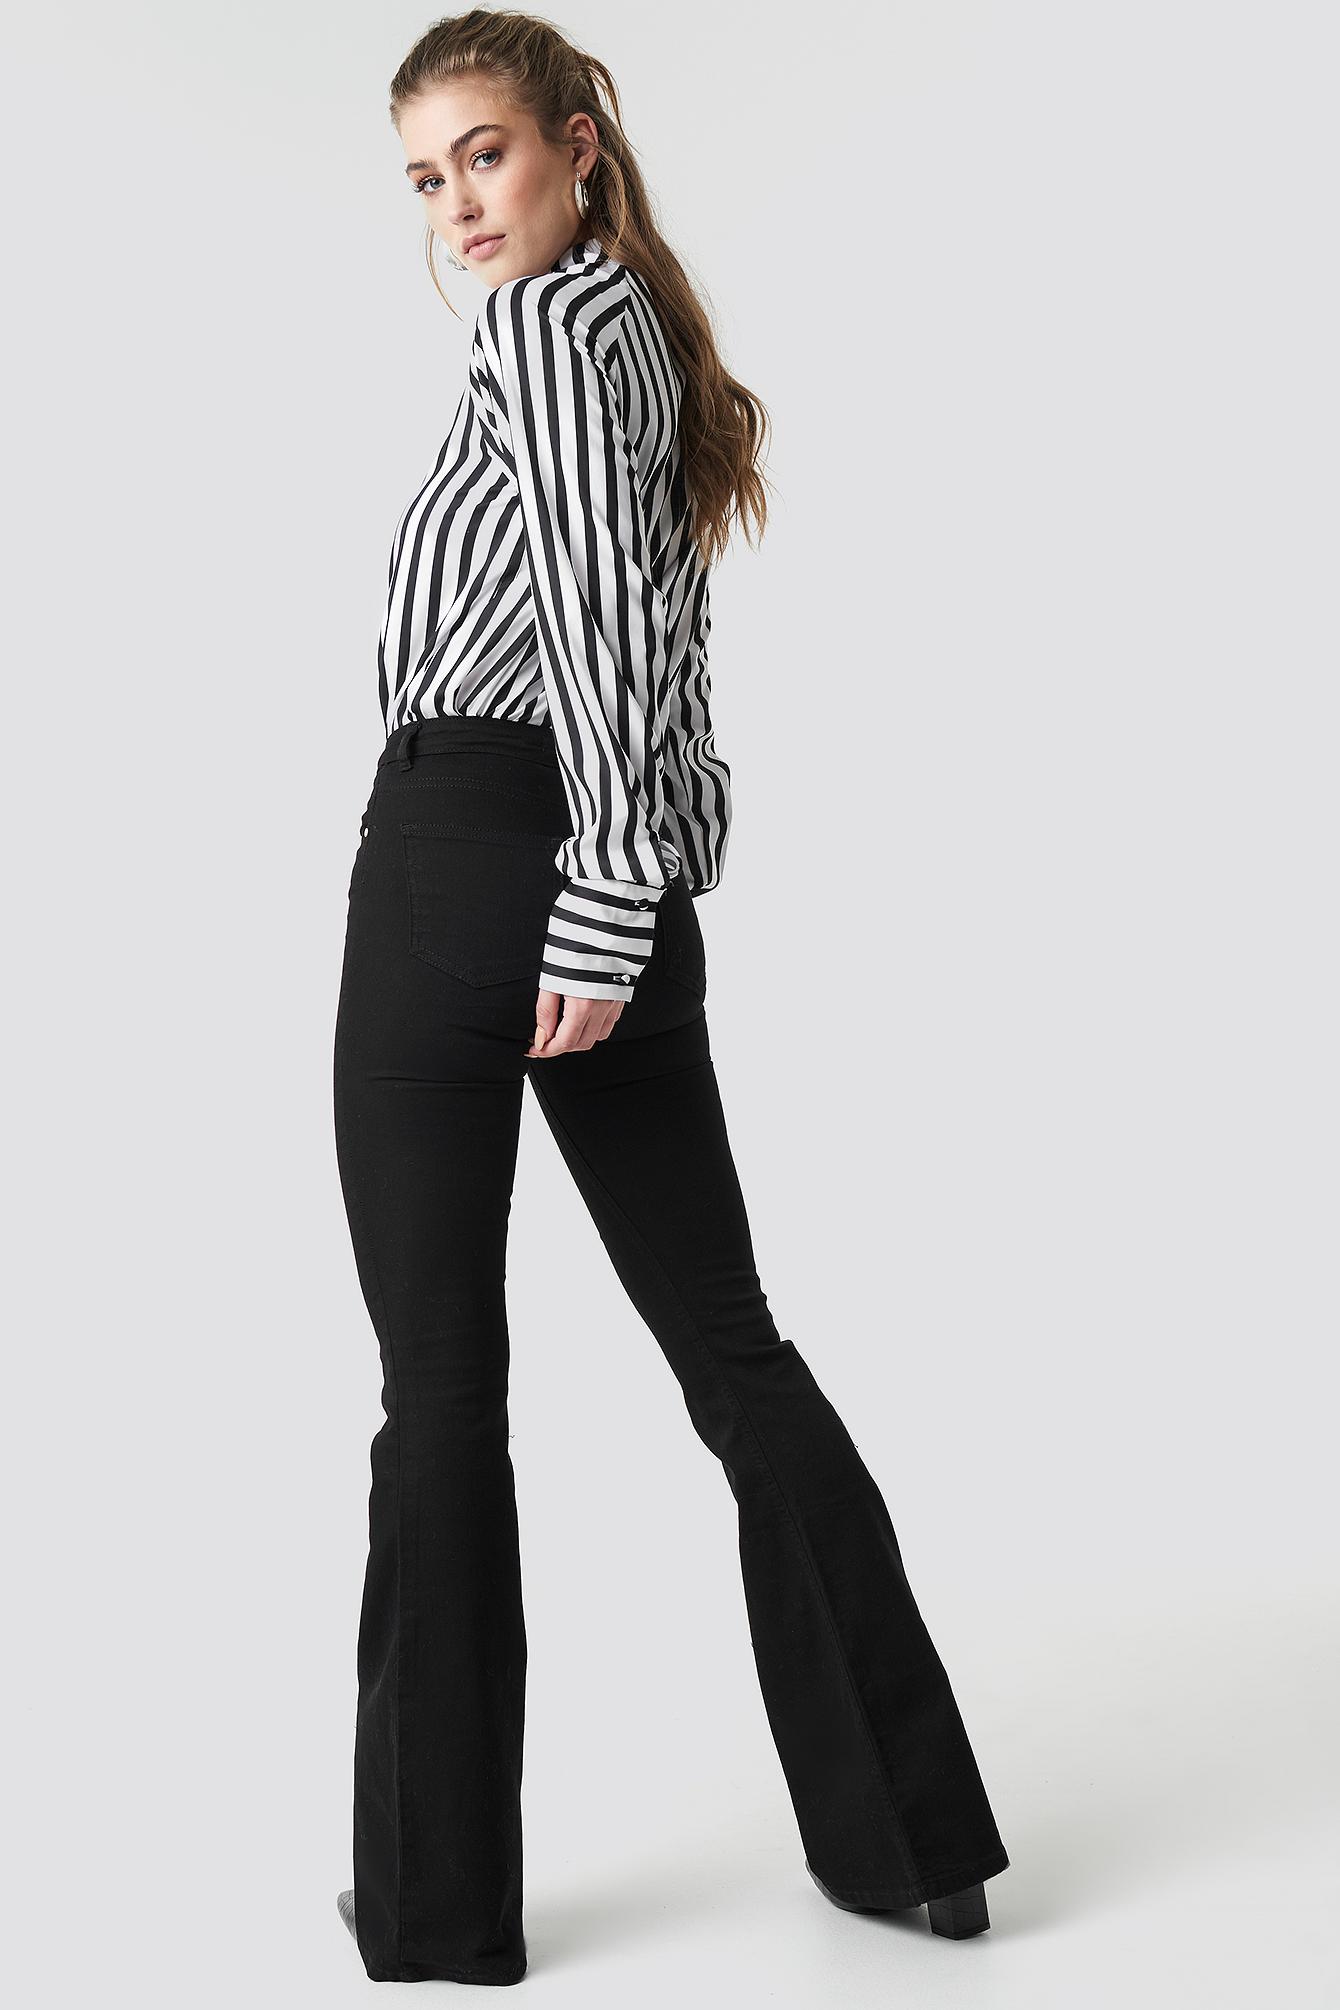 Milla High Waist Flared Jeans NA-KD.COM